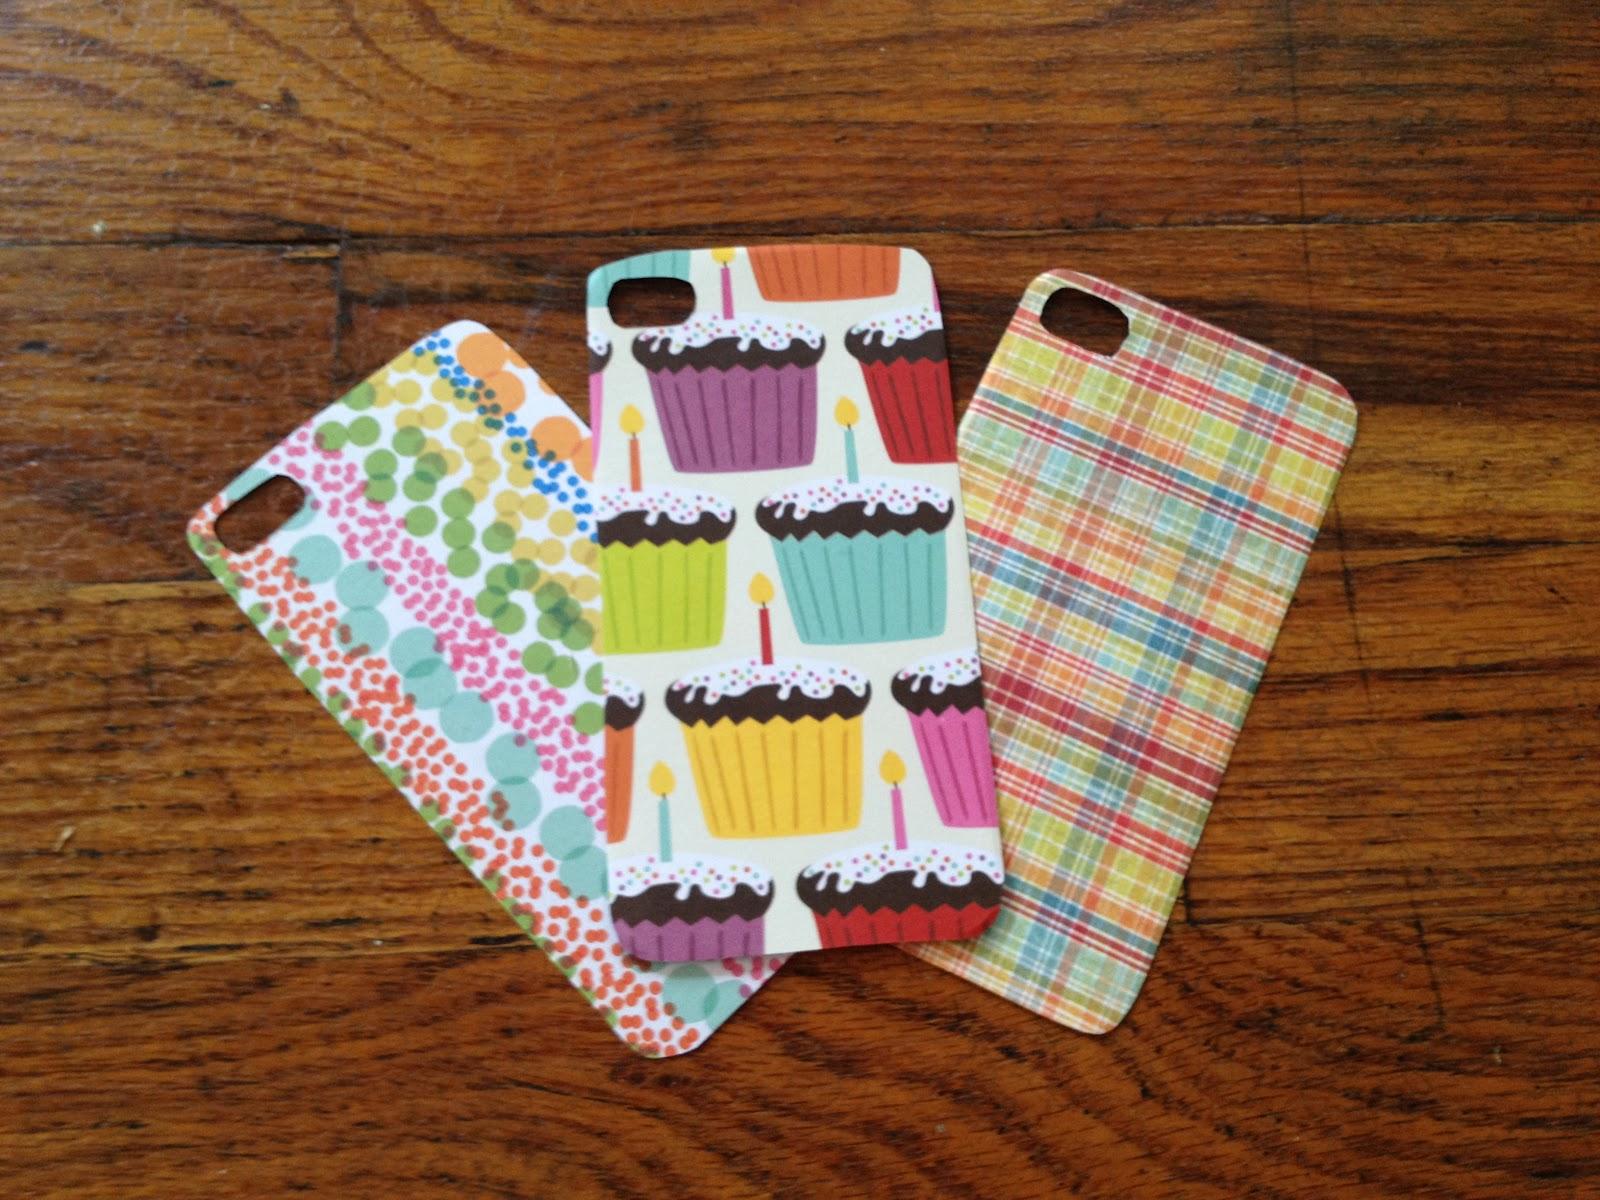 Scrapbook paper case - Diy Scrapbook Paper Iphone Case